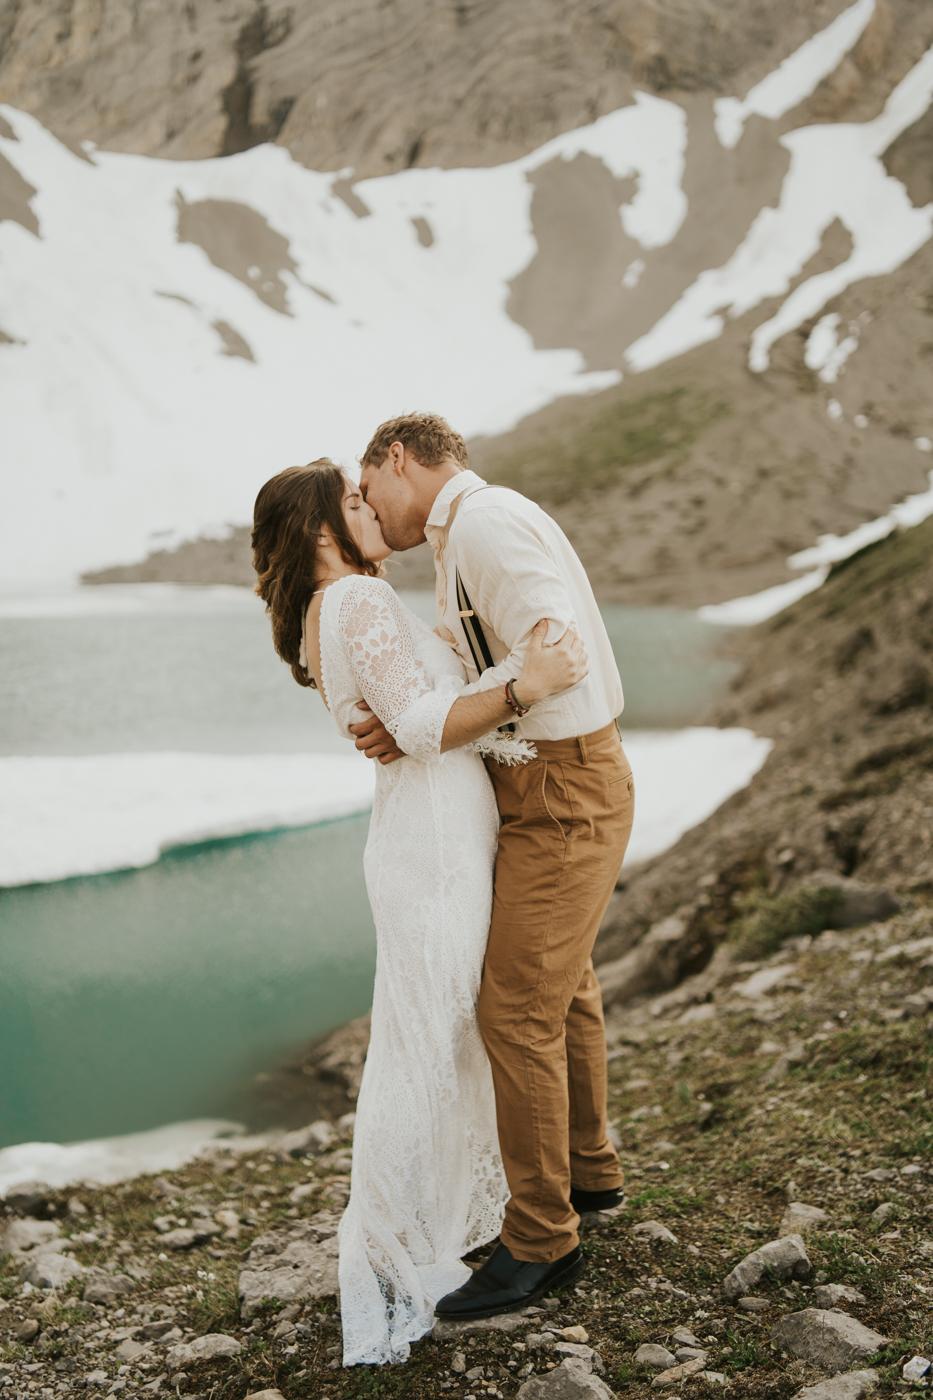 tyraephotography_photographer_wedding_elopement_engagement_photography-07614.jpg